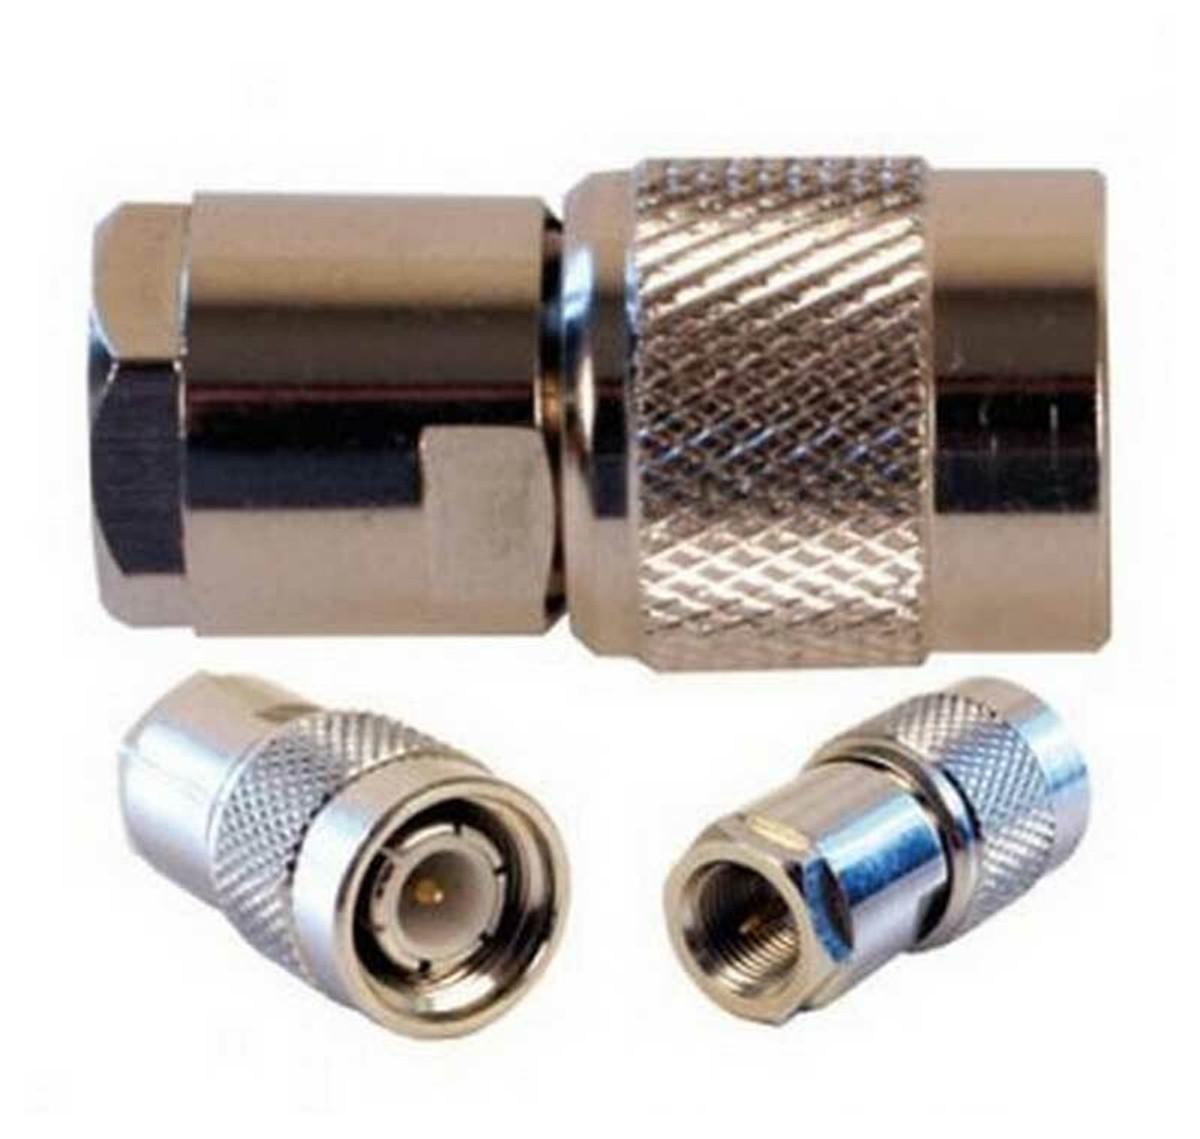 Wilson Electronics weBoost Wilson 971106 FME-Male to TNC-Male Connector